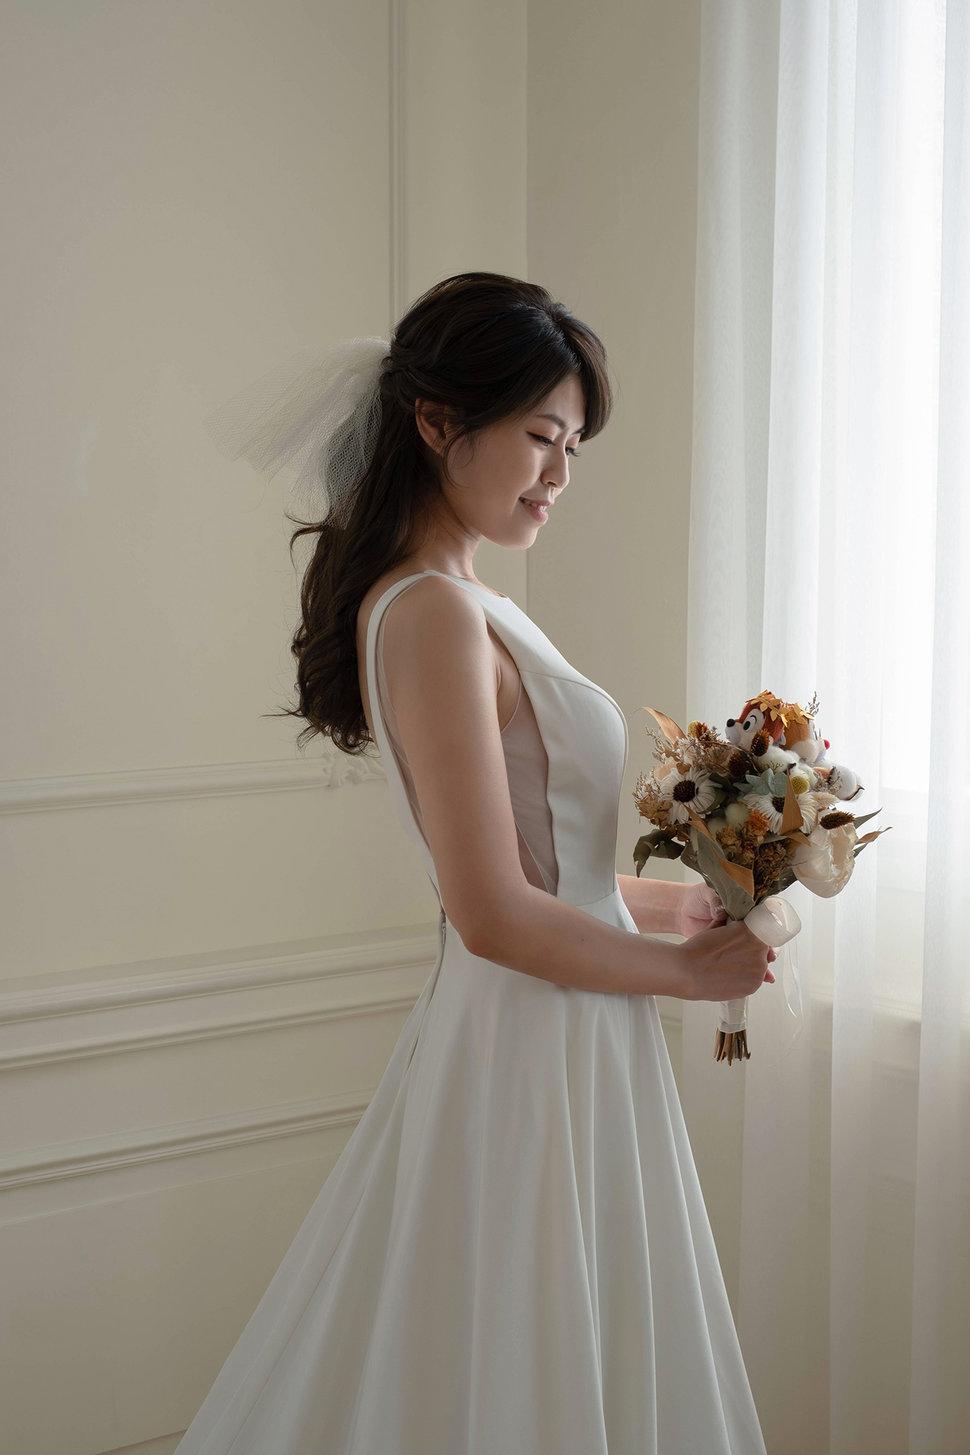 DSCF33652拷貝 - Stylist Leann 麗如《結婚吧》